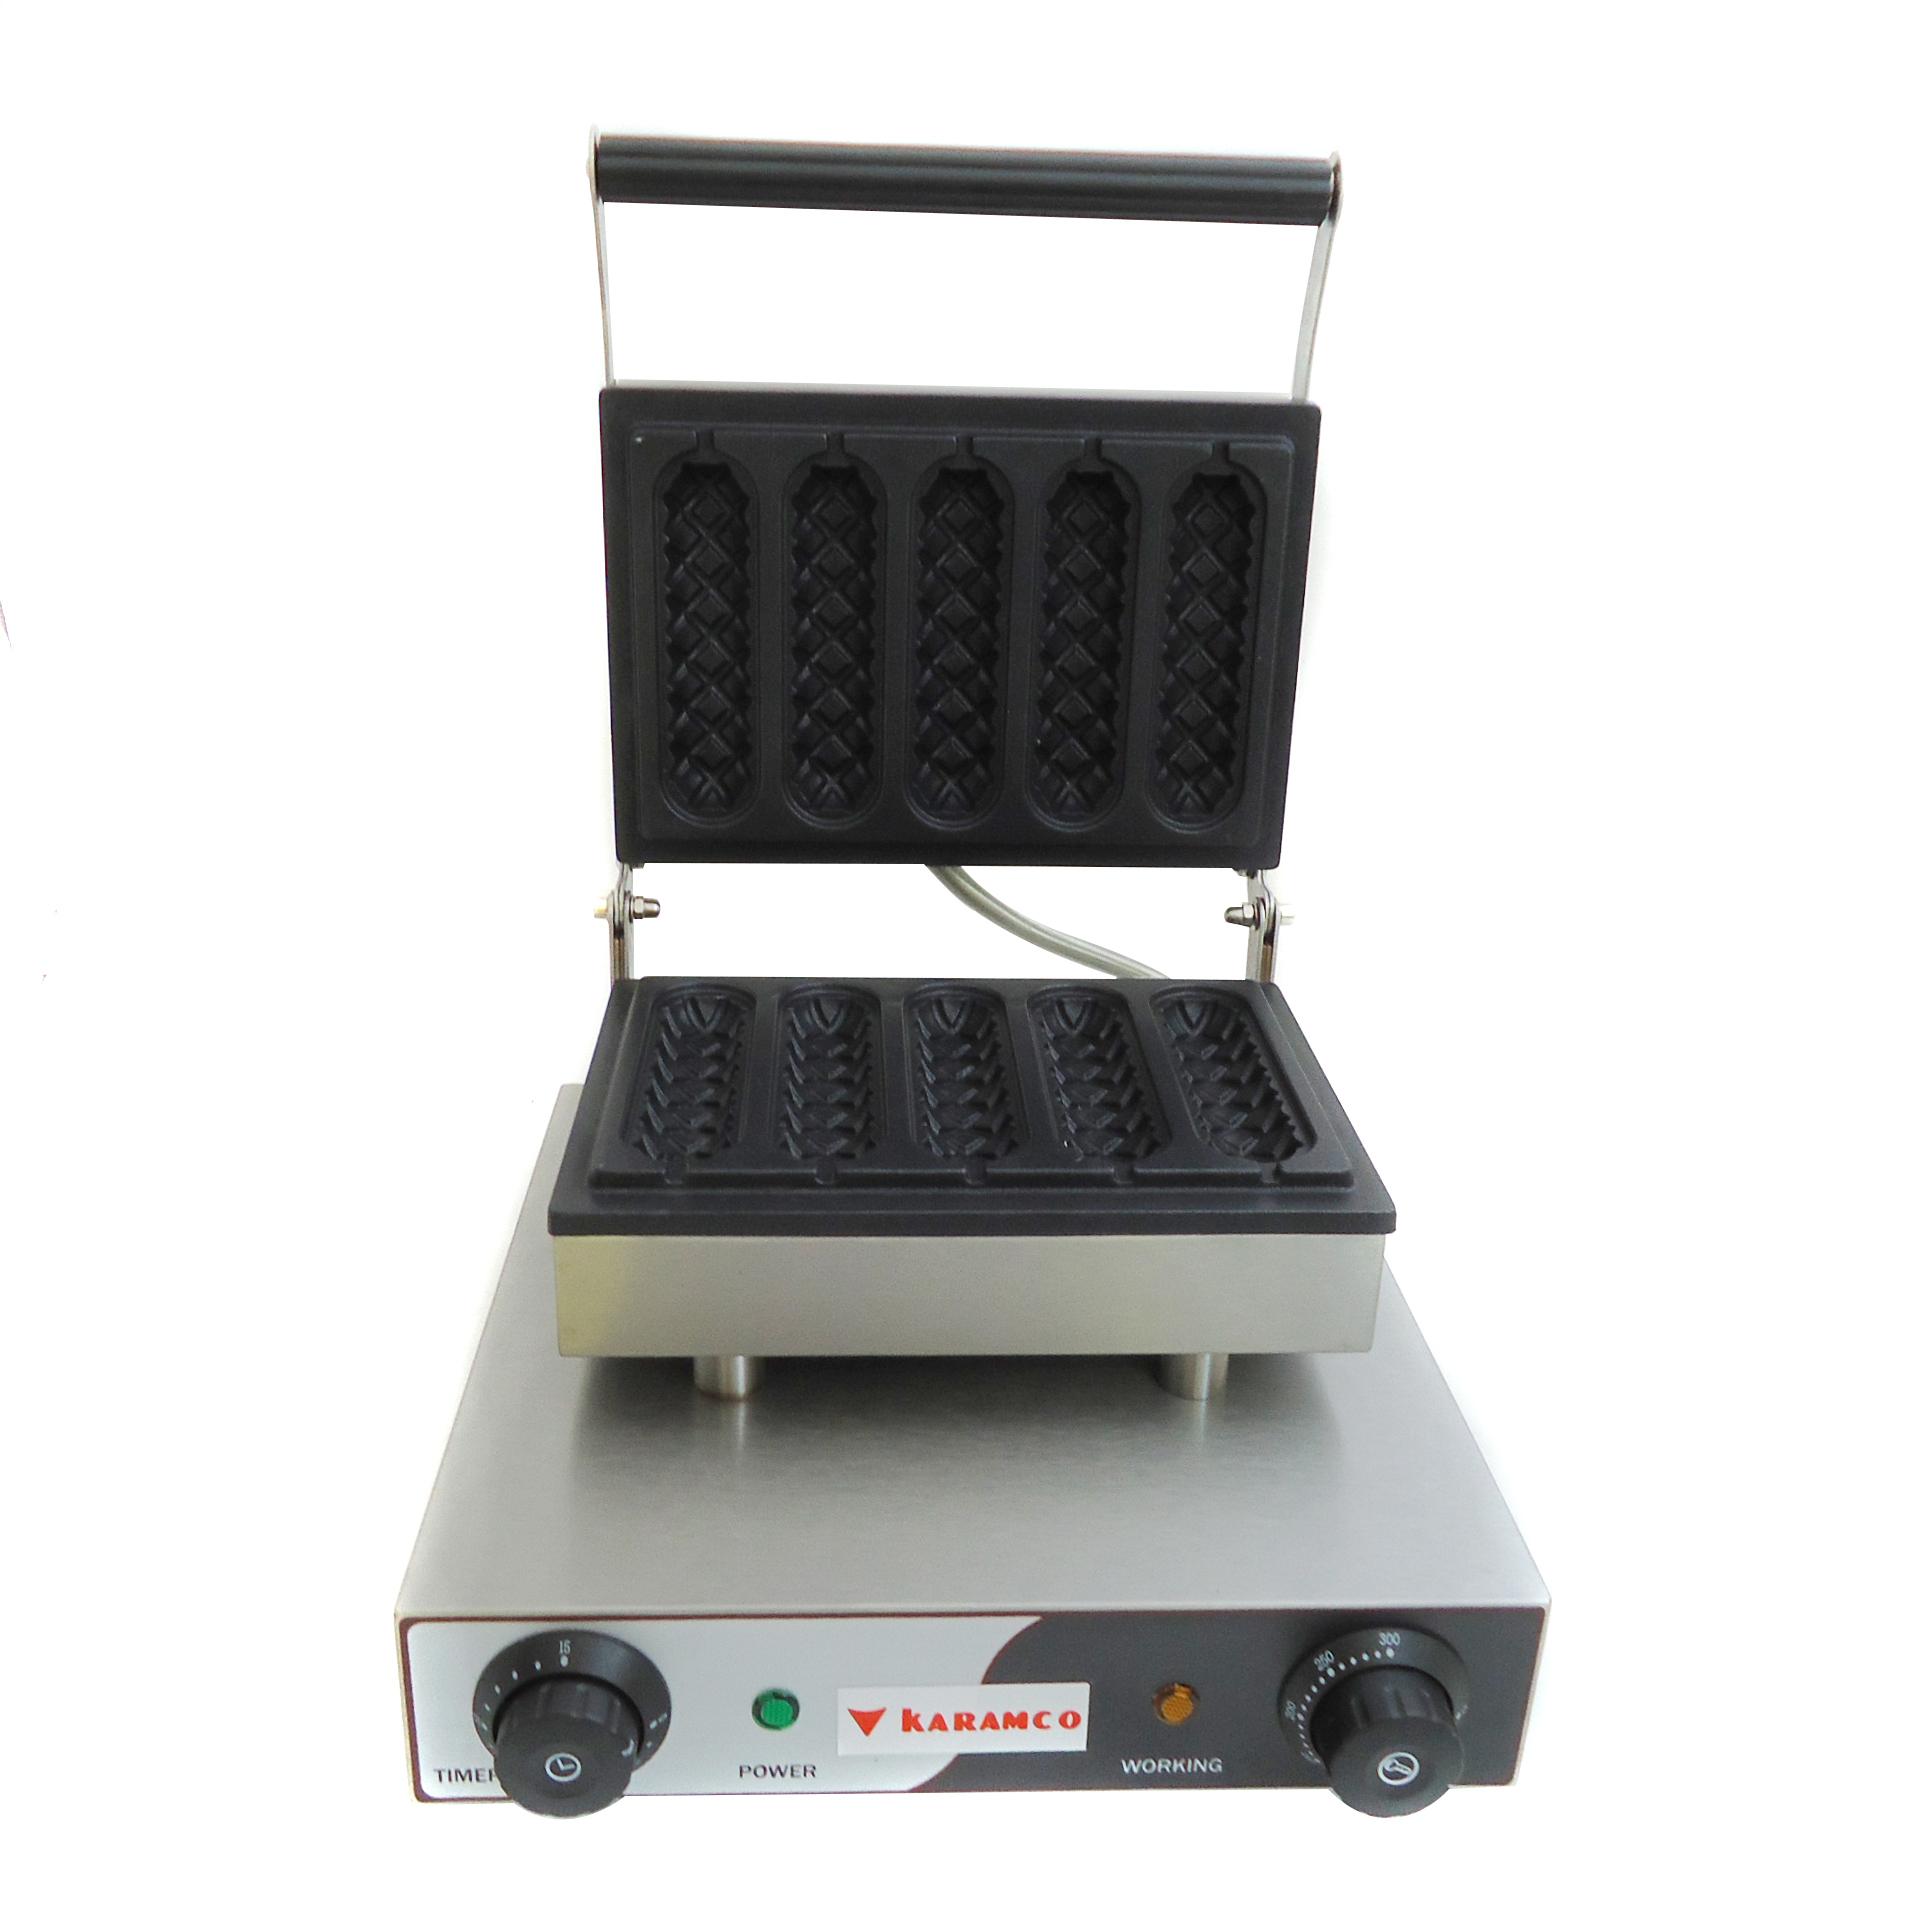 WB15 Βαφλιέρα Συσκευή για Βάφλες Μονή για Βάφλα Μπαγκέτα - Διαστάσεις Πλάκας: 27 επαγγελματικός εξοπλισμός   φούρνοι μικροκύματα κρεπιέρες βαφλιέρες φριτέζες   β